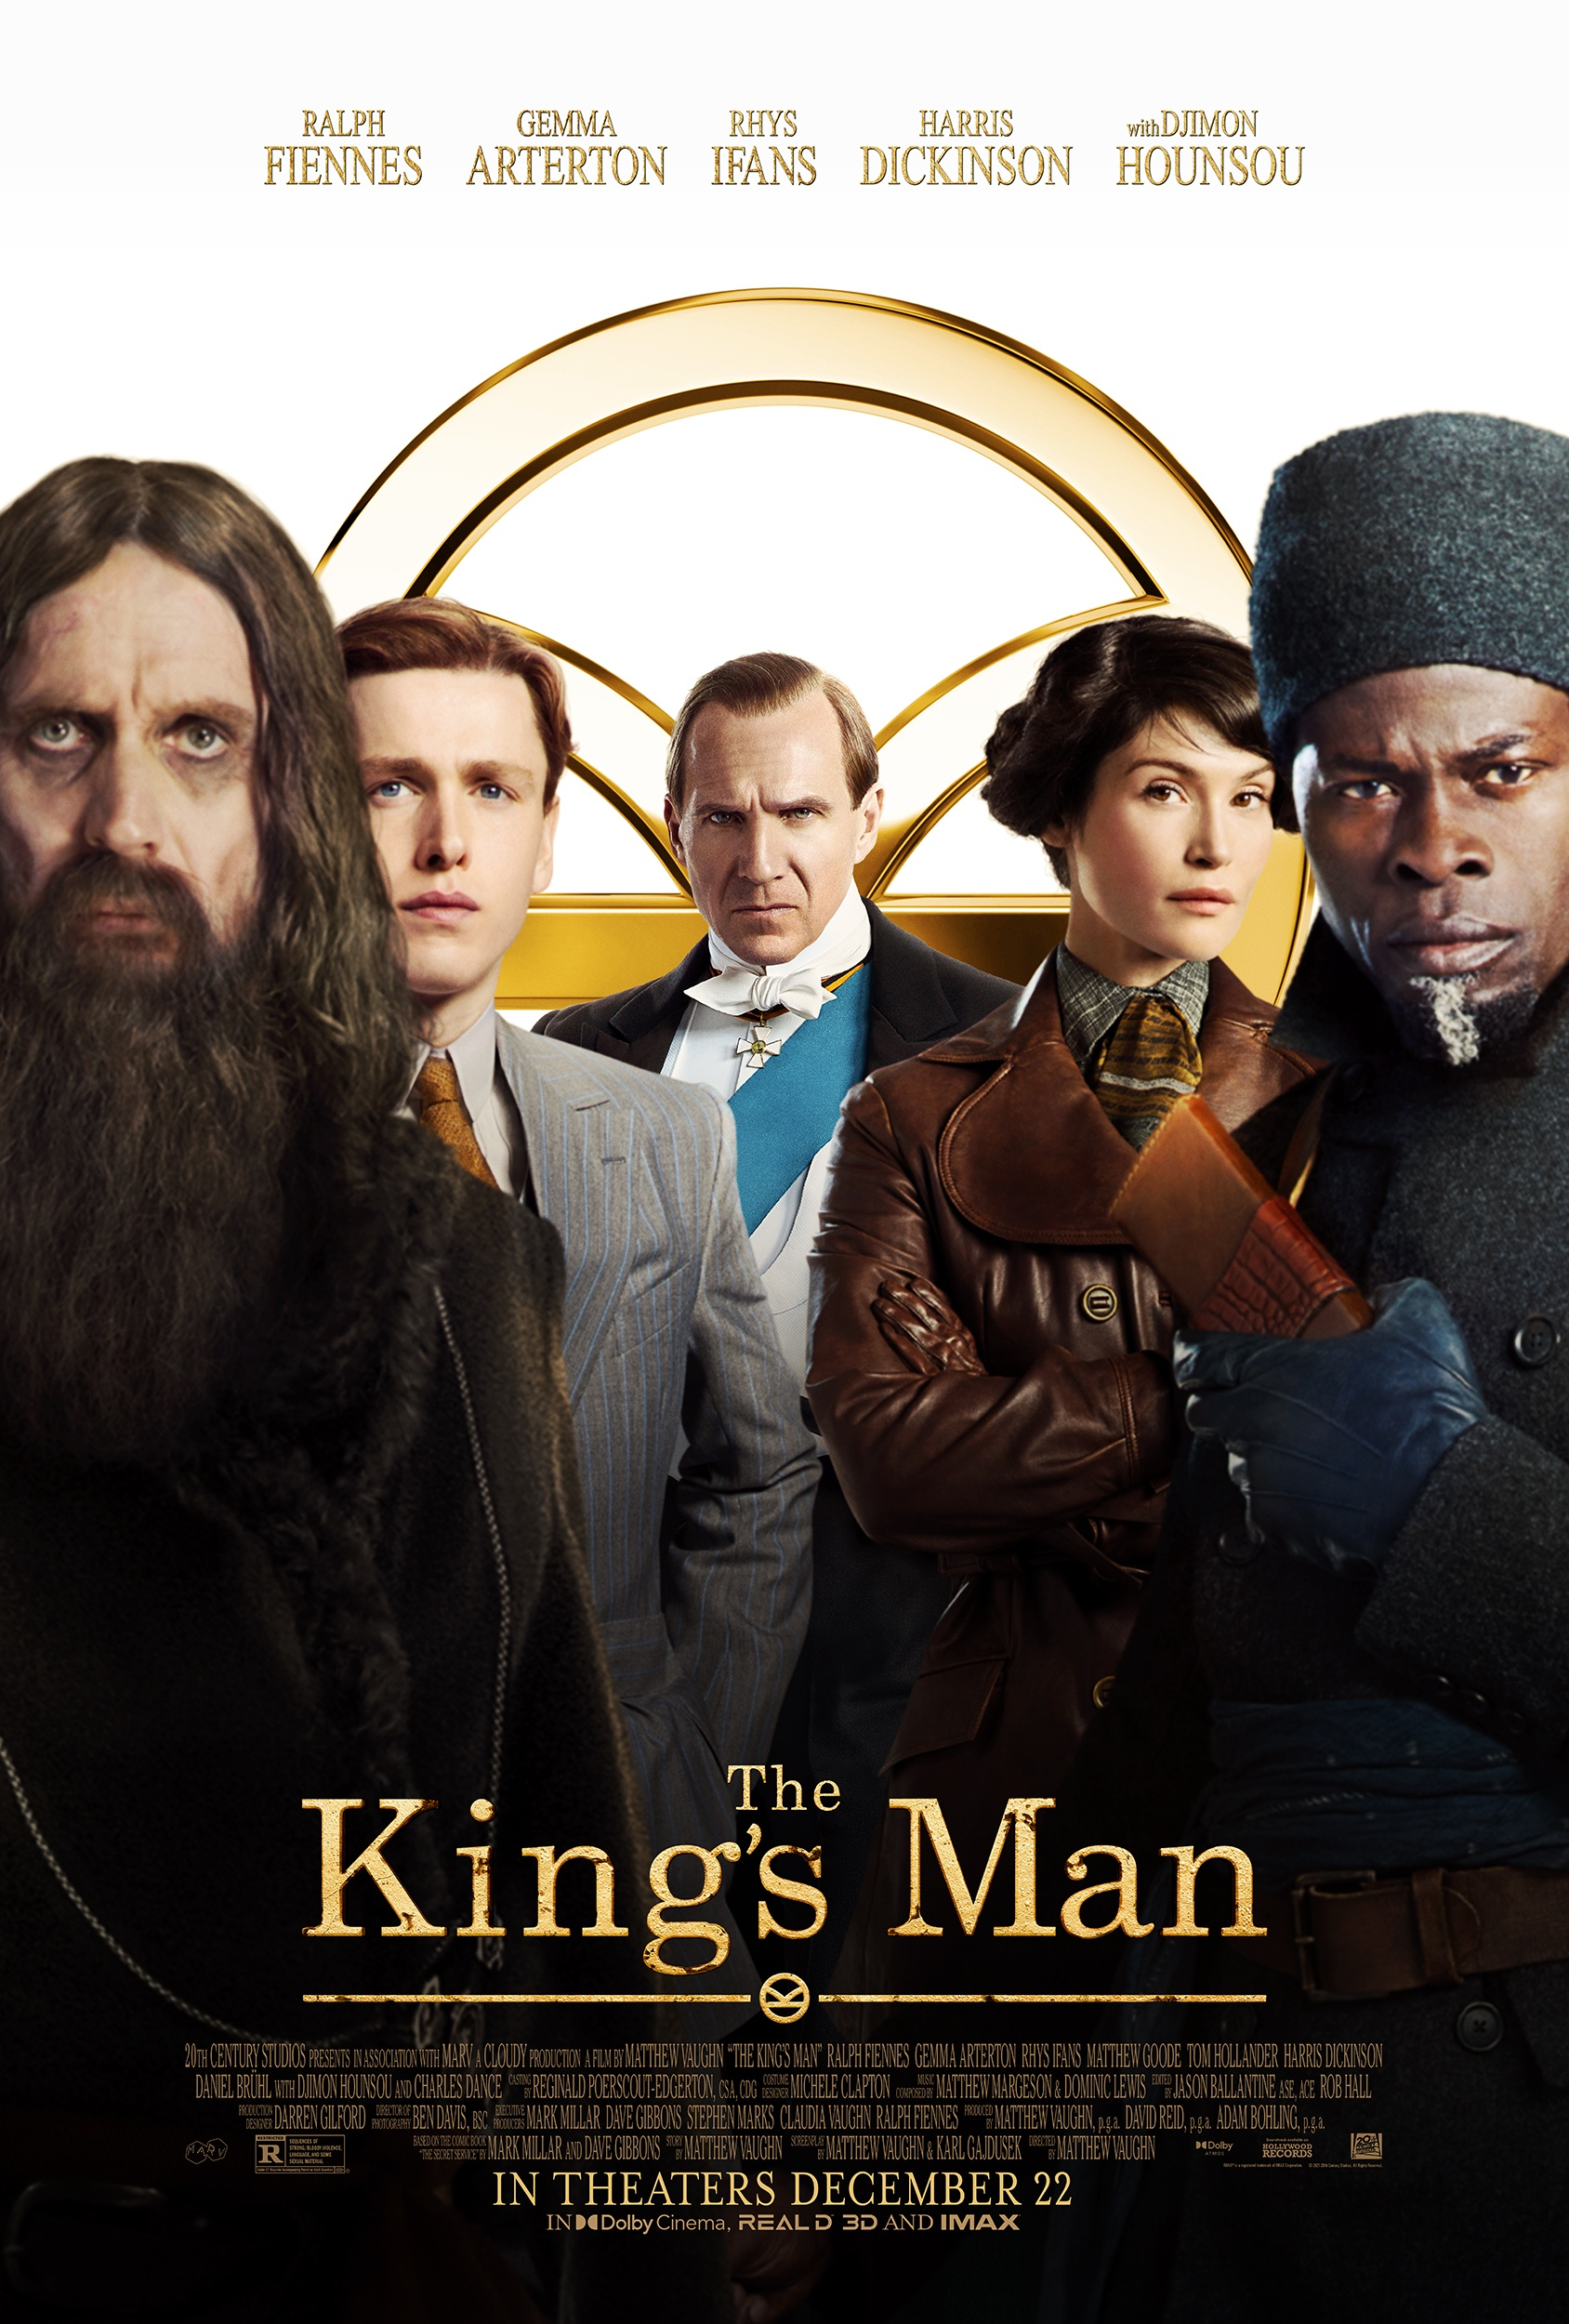 New Movie: The Kings Man Starring Ralph Fiennes, Djimon Hounsou